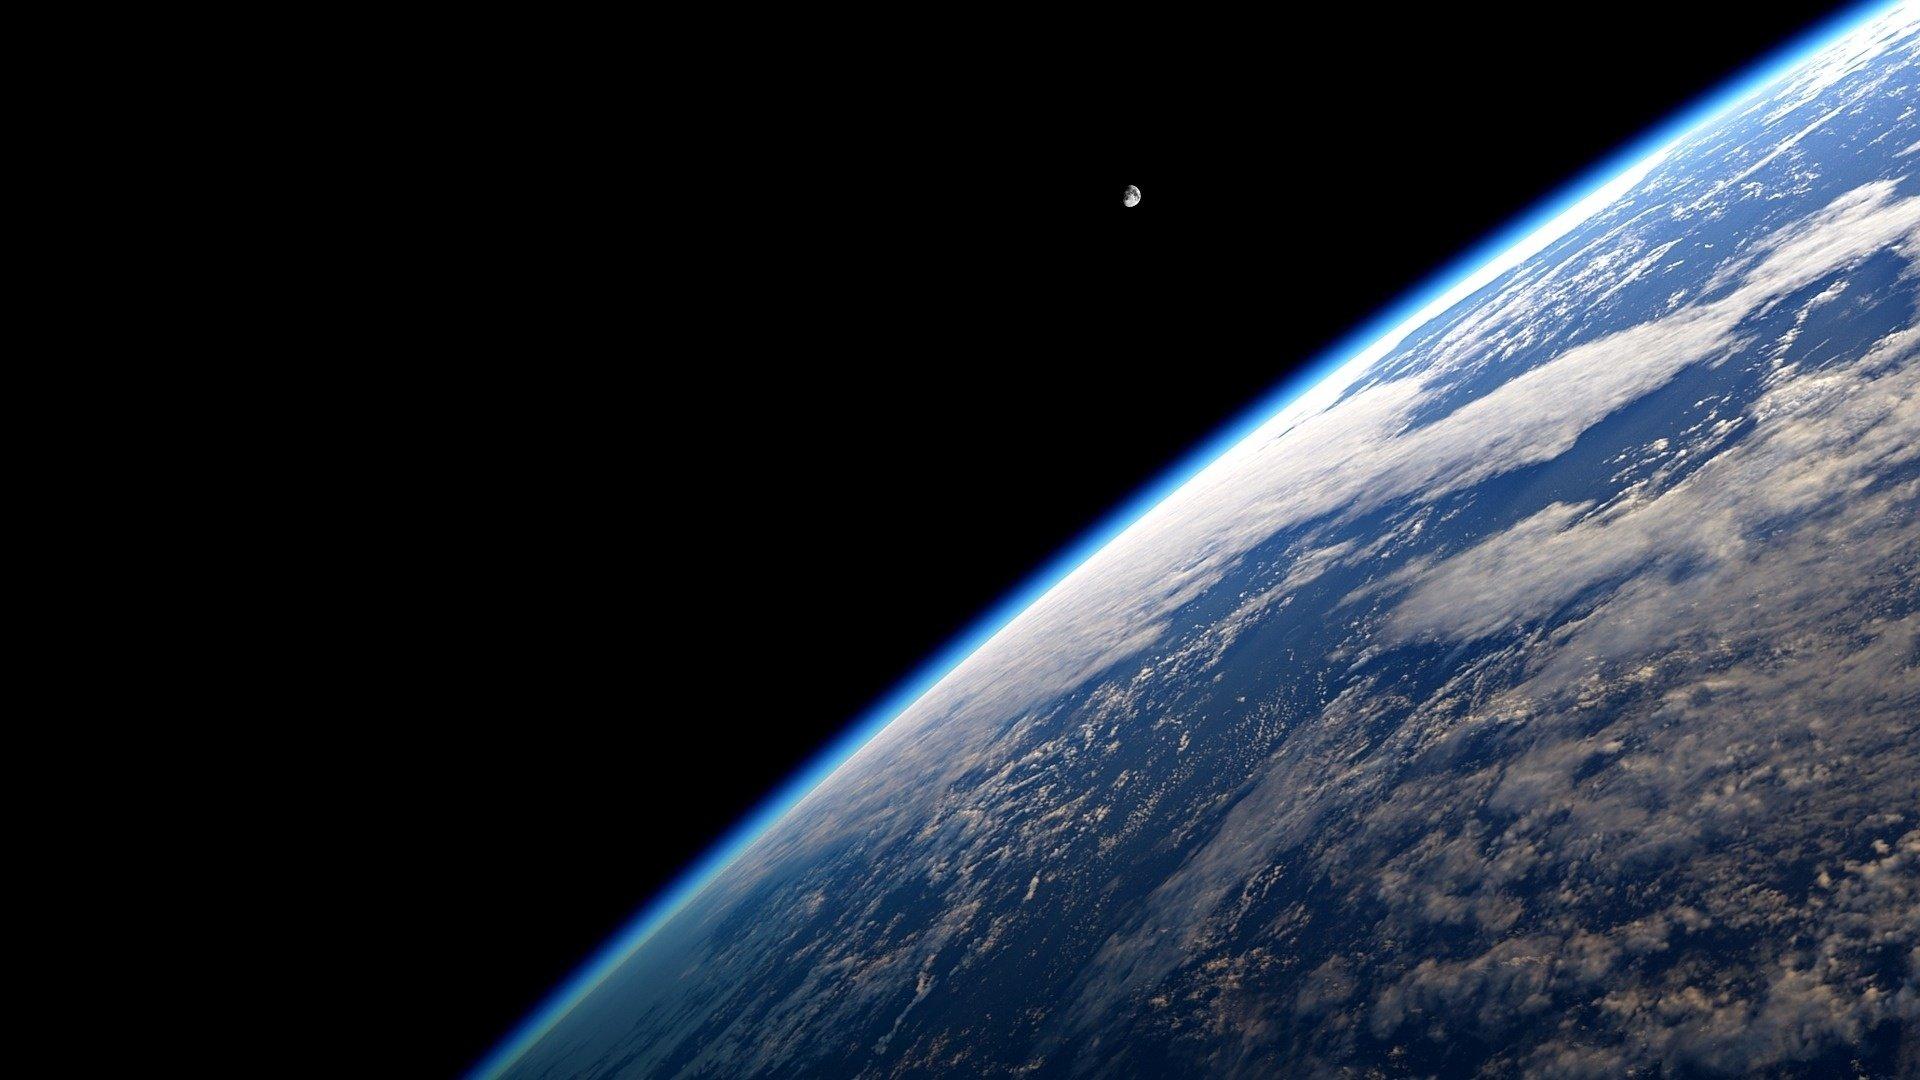 48 Earth From Space Hd Wallpaper On Wallpapersafari